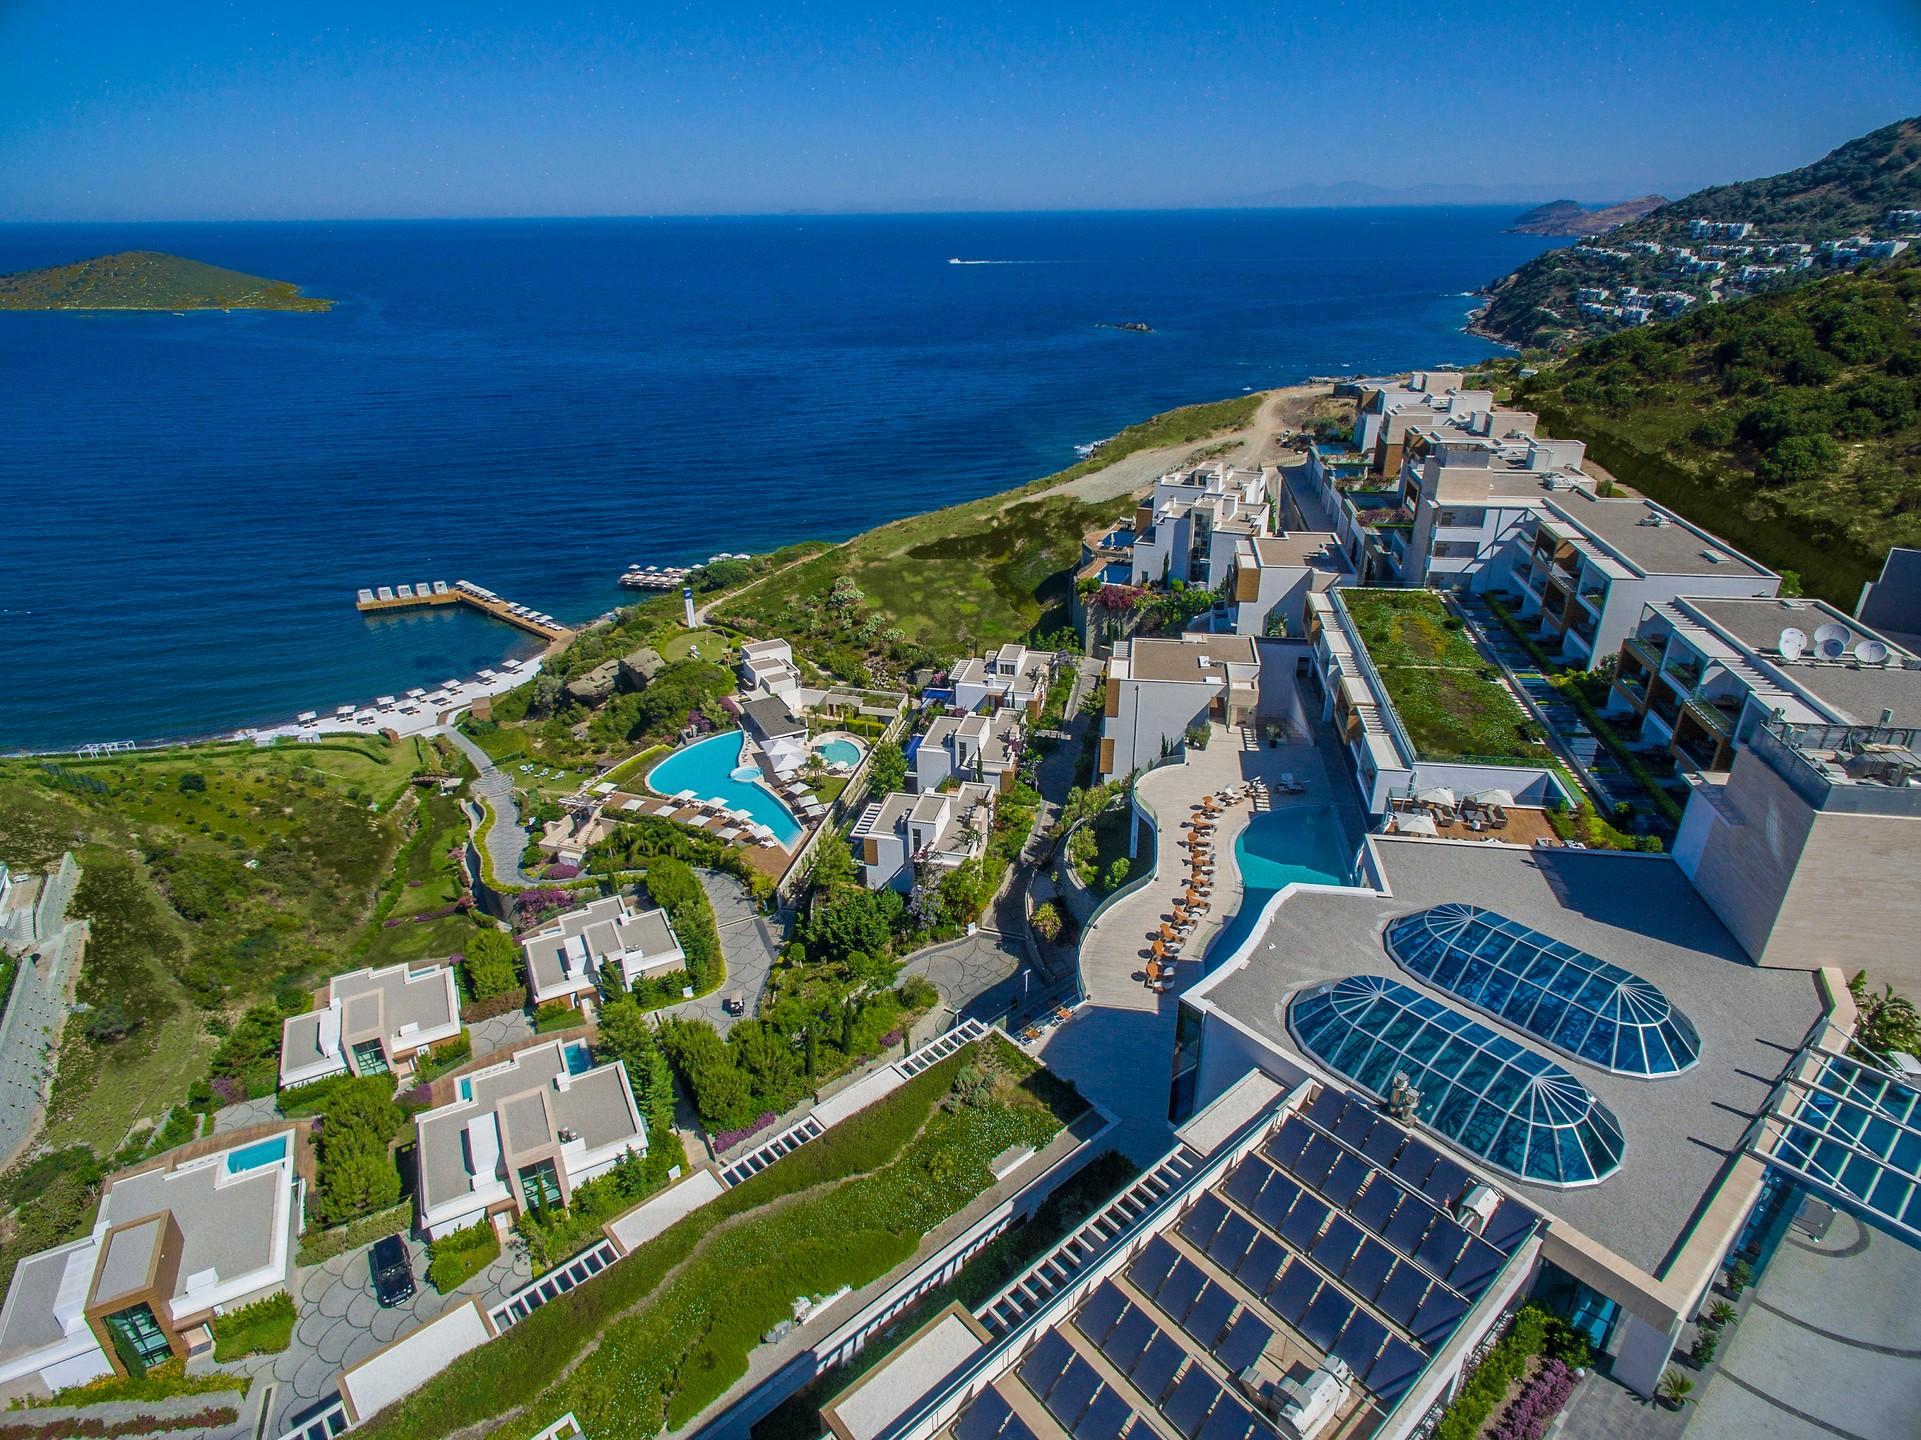 Sirene-Luxury-Hotel-Bodrum-Genel-282467